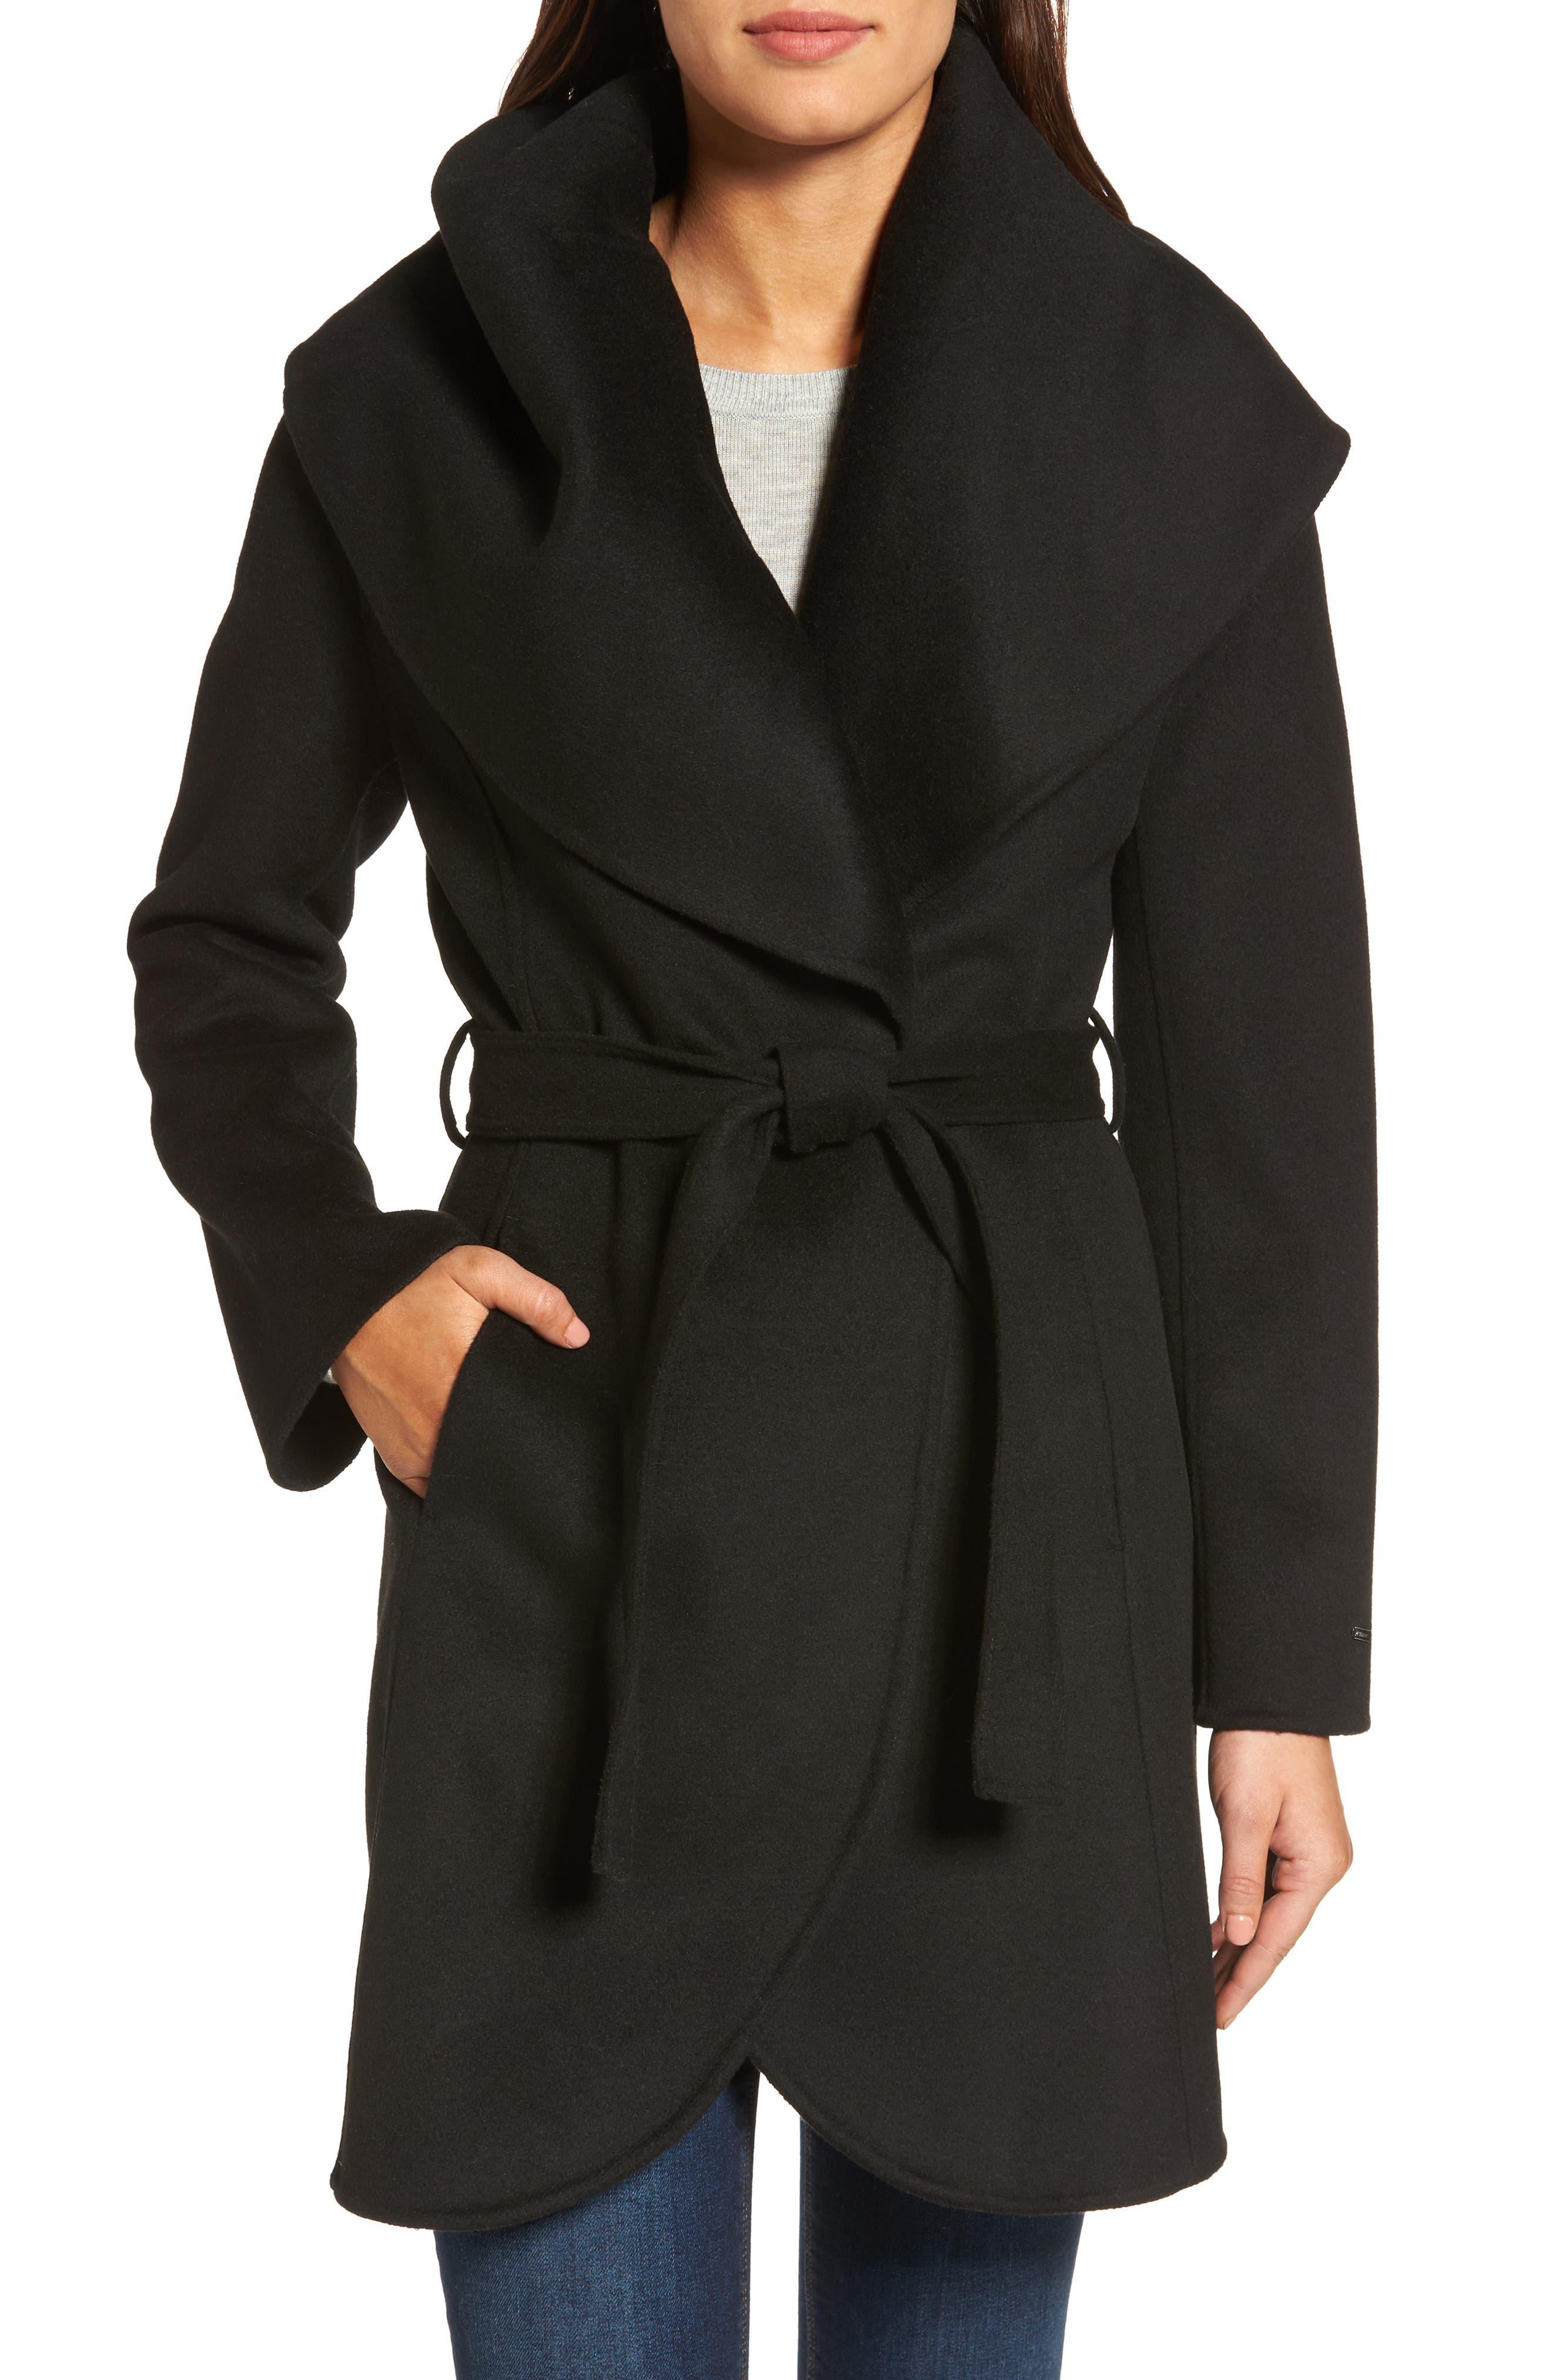 Marla Double Face Wool Blend Wrap Coat,                             Main thumbnail 1, color,                             001